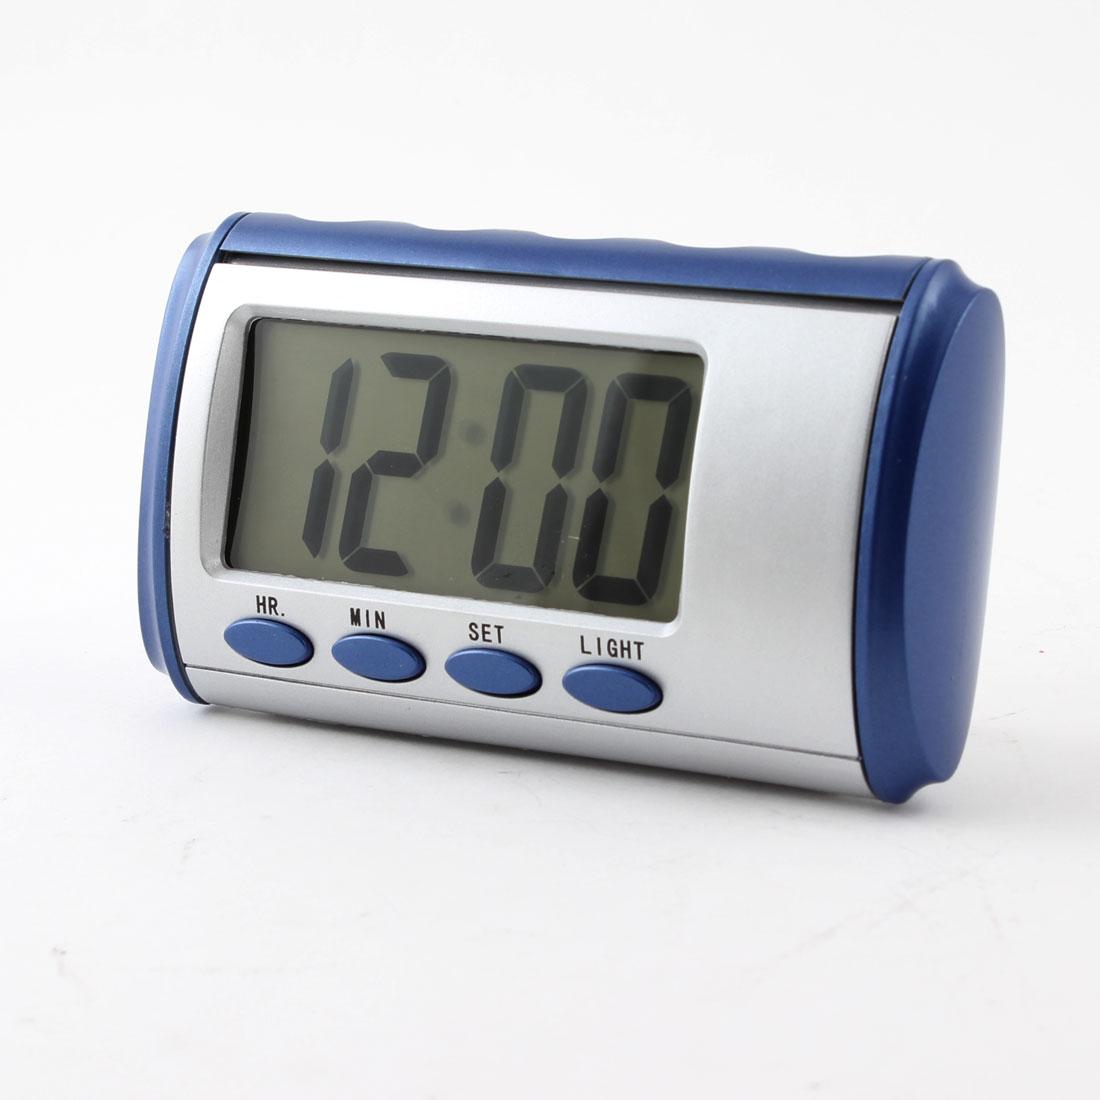 Car Home Pocket 4 Button Hour Minute LCD Digital Clock Silver Tone Blue